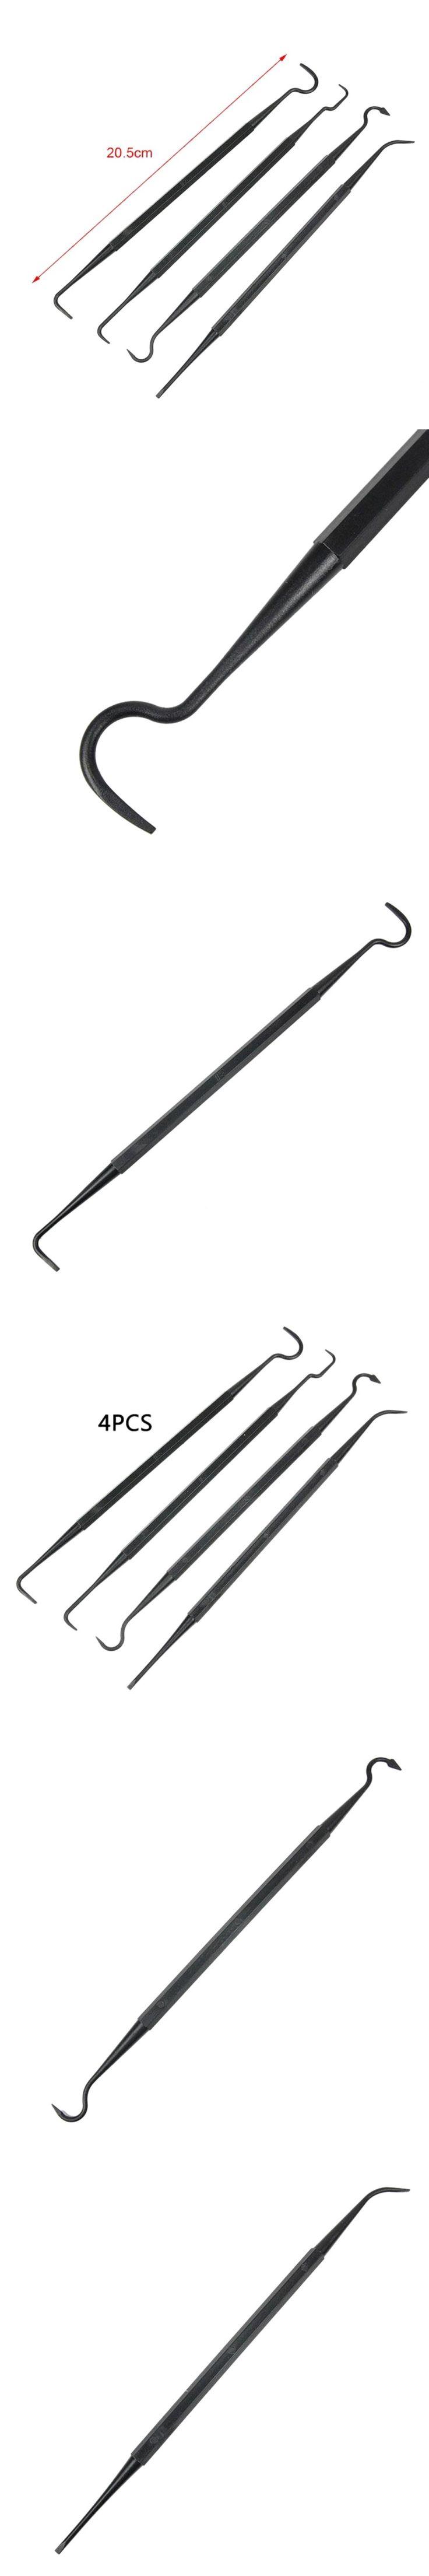 4 pcs/set Pistol Brush Cleaner Kit Airsoft Tactical Rifle Gun Cleaning Nylon Pick Shotgun Tube Hunting Gun Accessories Tool NEW